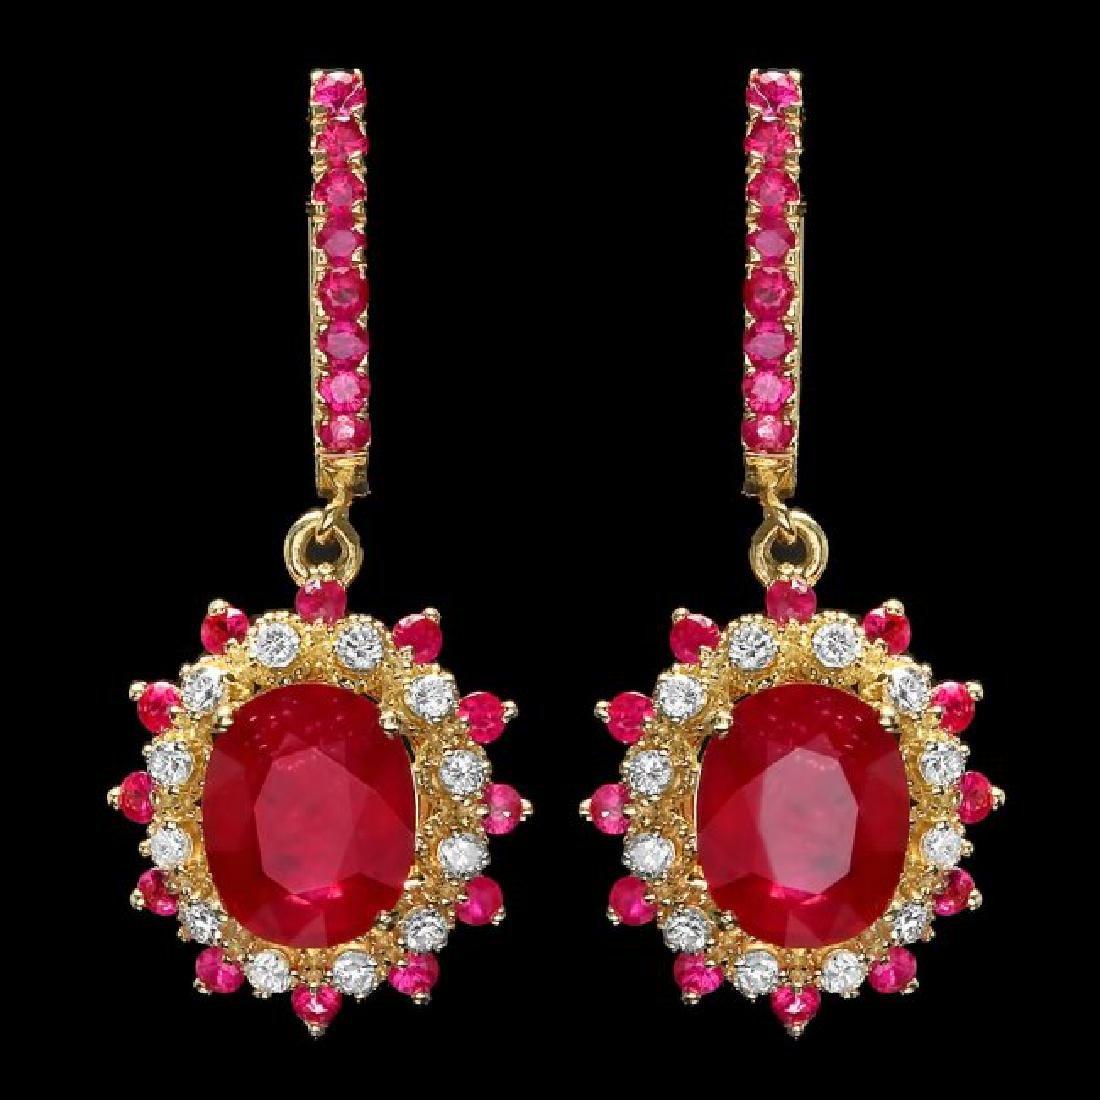 14k Gold 8.55ct Ruby 0.60ct Diamond Earrings - 2